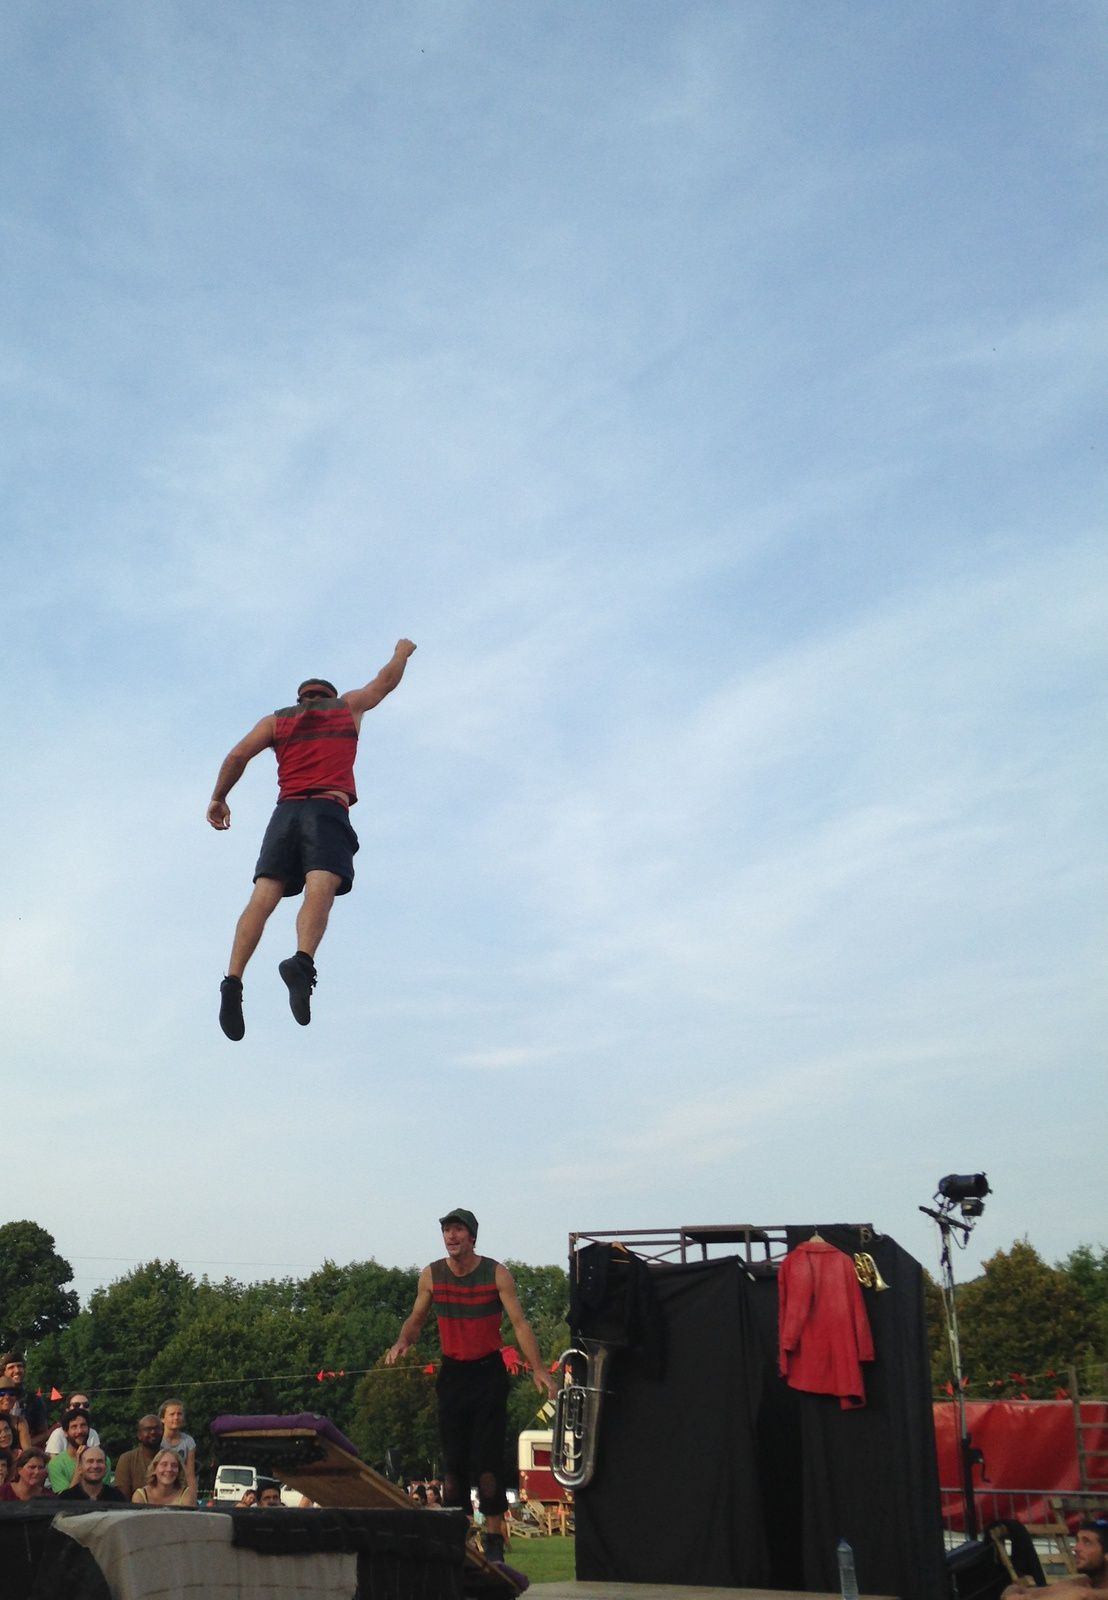 #cietoidabord #encoreplus #cirque #saut #theatre #aurillac #festival #charlotteblabla blog